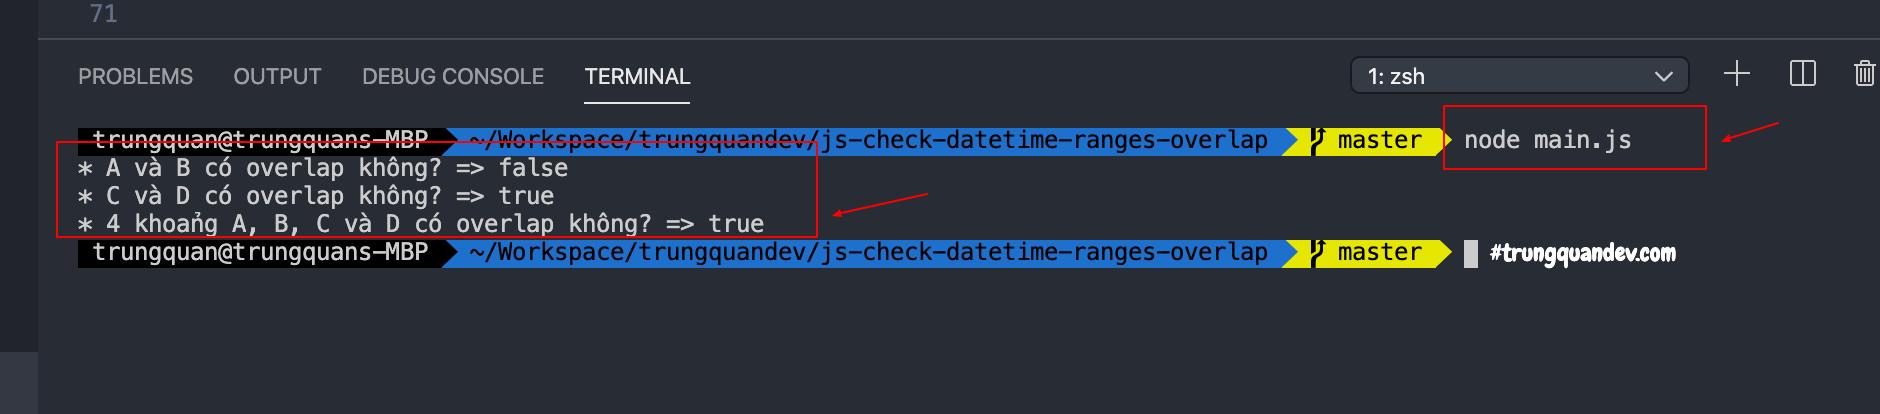 js-check-datetime-ranges-overlap-trungquandev-02